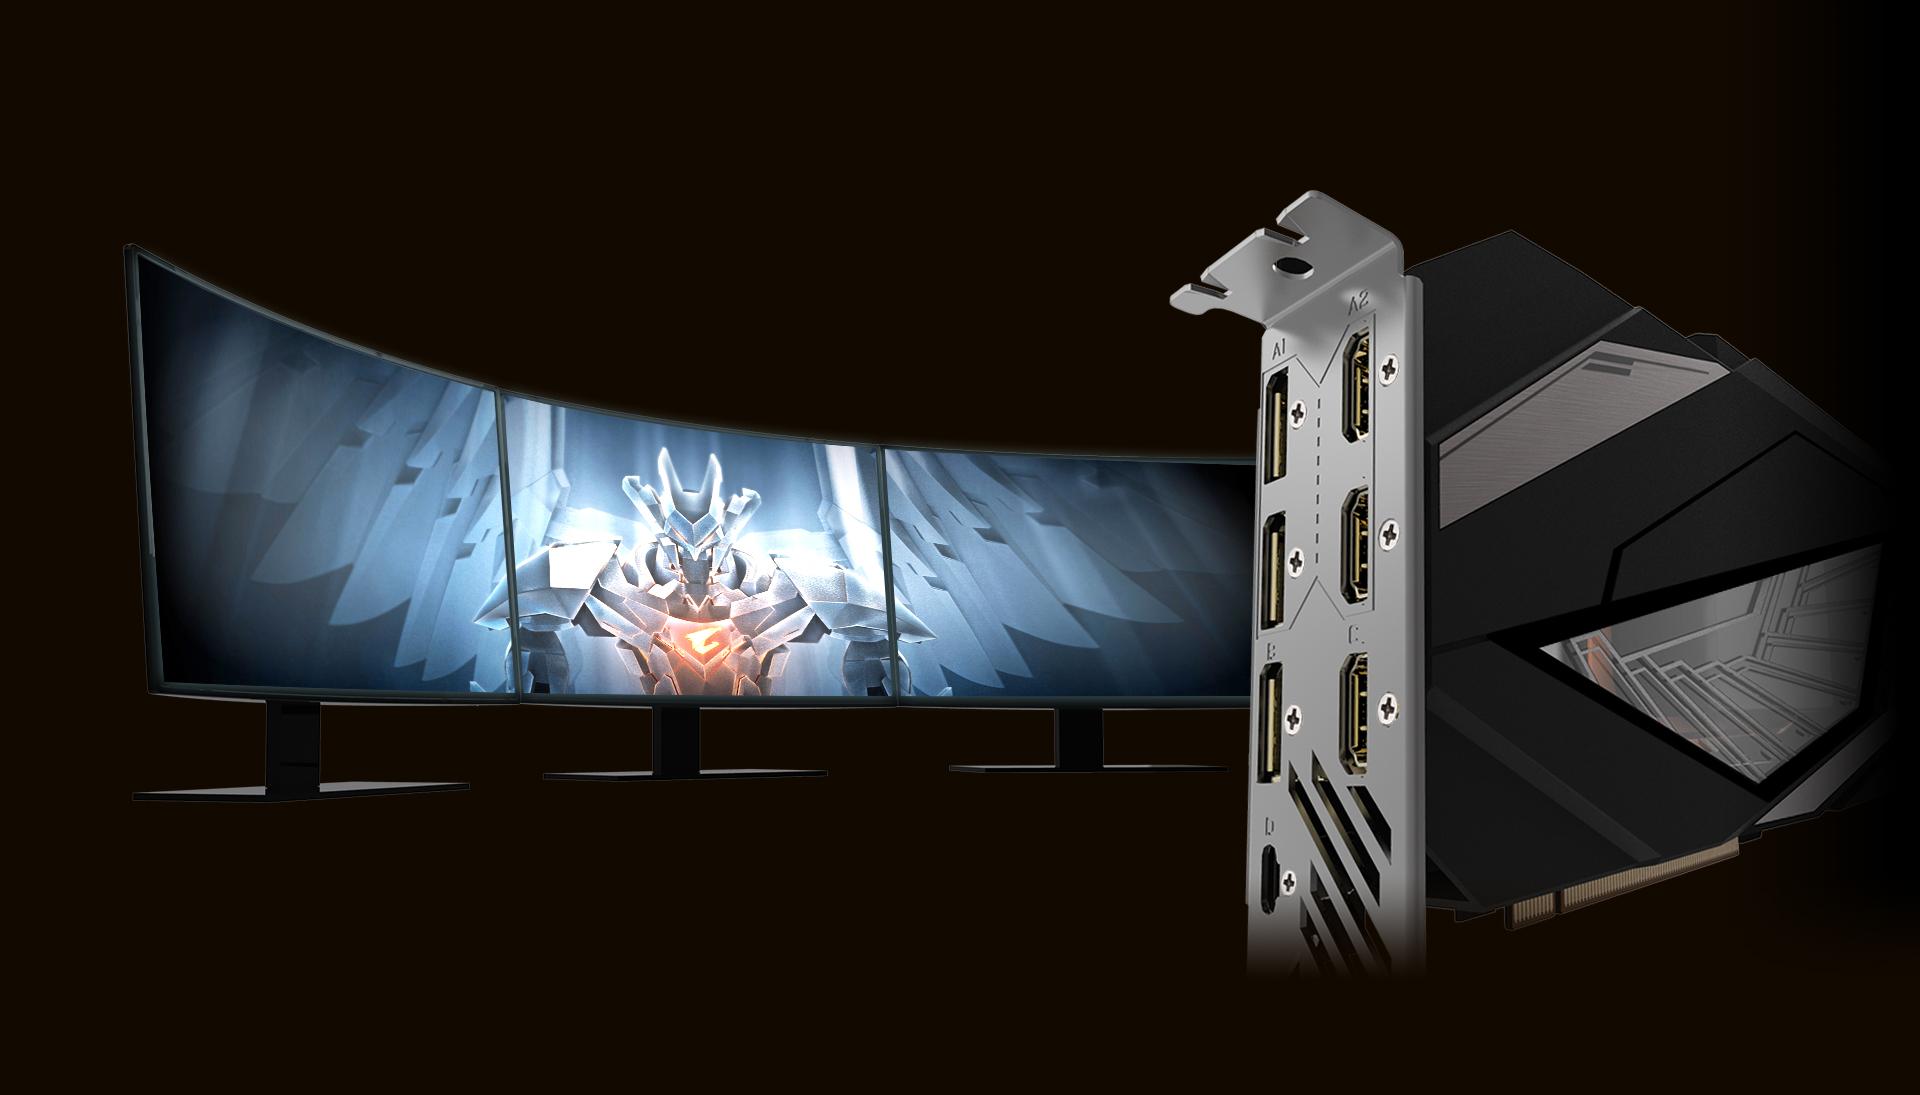 AORUS GeForce RTX™ 2080 Ti XTREME WATERFORCE 11G Powered by GeForce RTX™ 2080 Ti 240mm radiator with 2x 120mm RGB fans WATERFORCE all-in-one cooling system کارت گرافیک گیگابایت اوروس 2080 Ti جی فورس آر تی آیکس اکستریم واترفورس 11 گیگابایت با کولینگ مایع مدار بسته